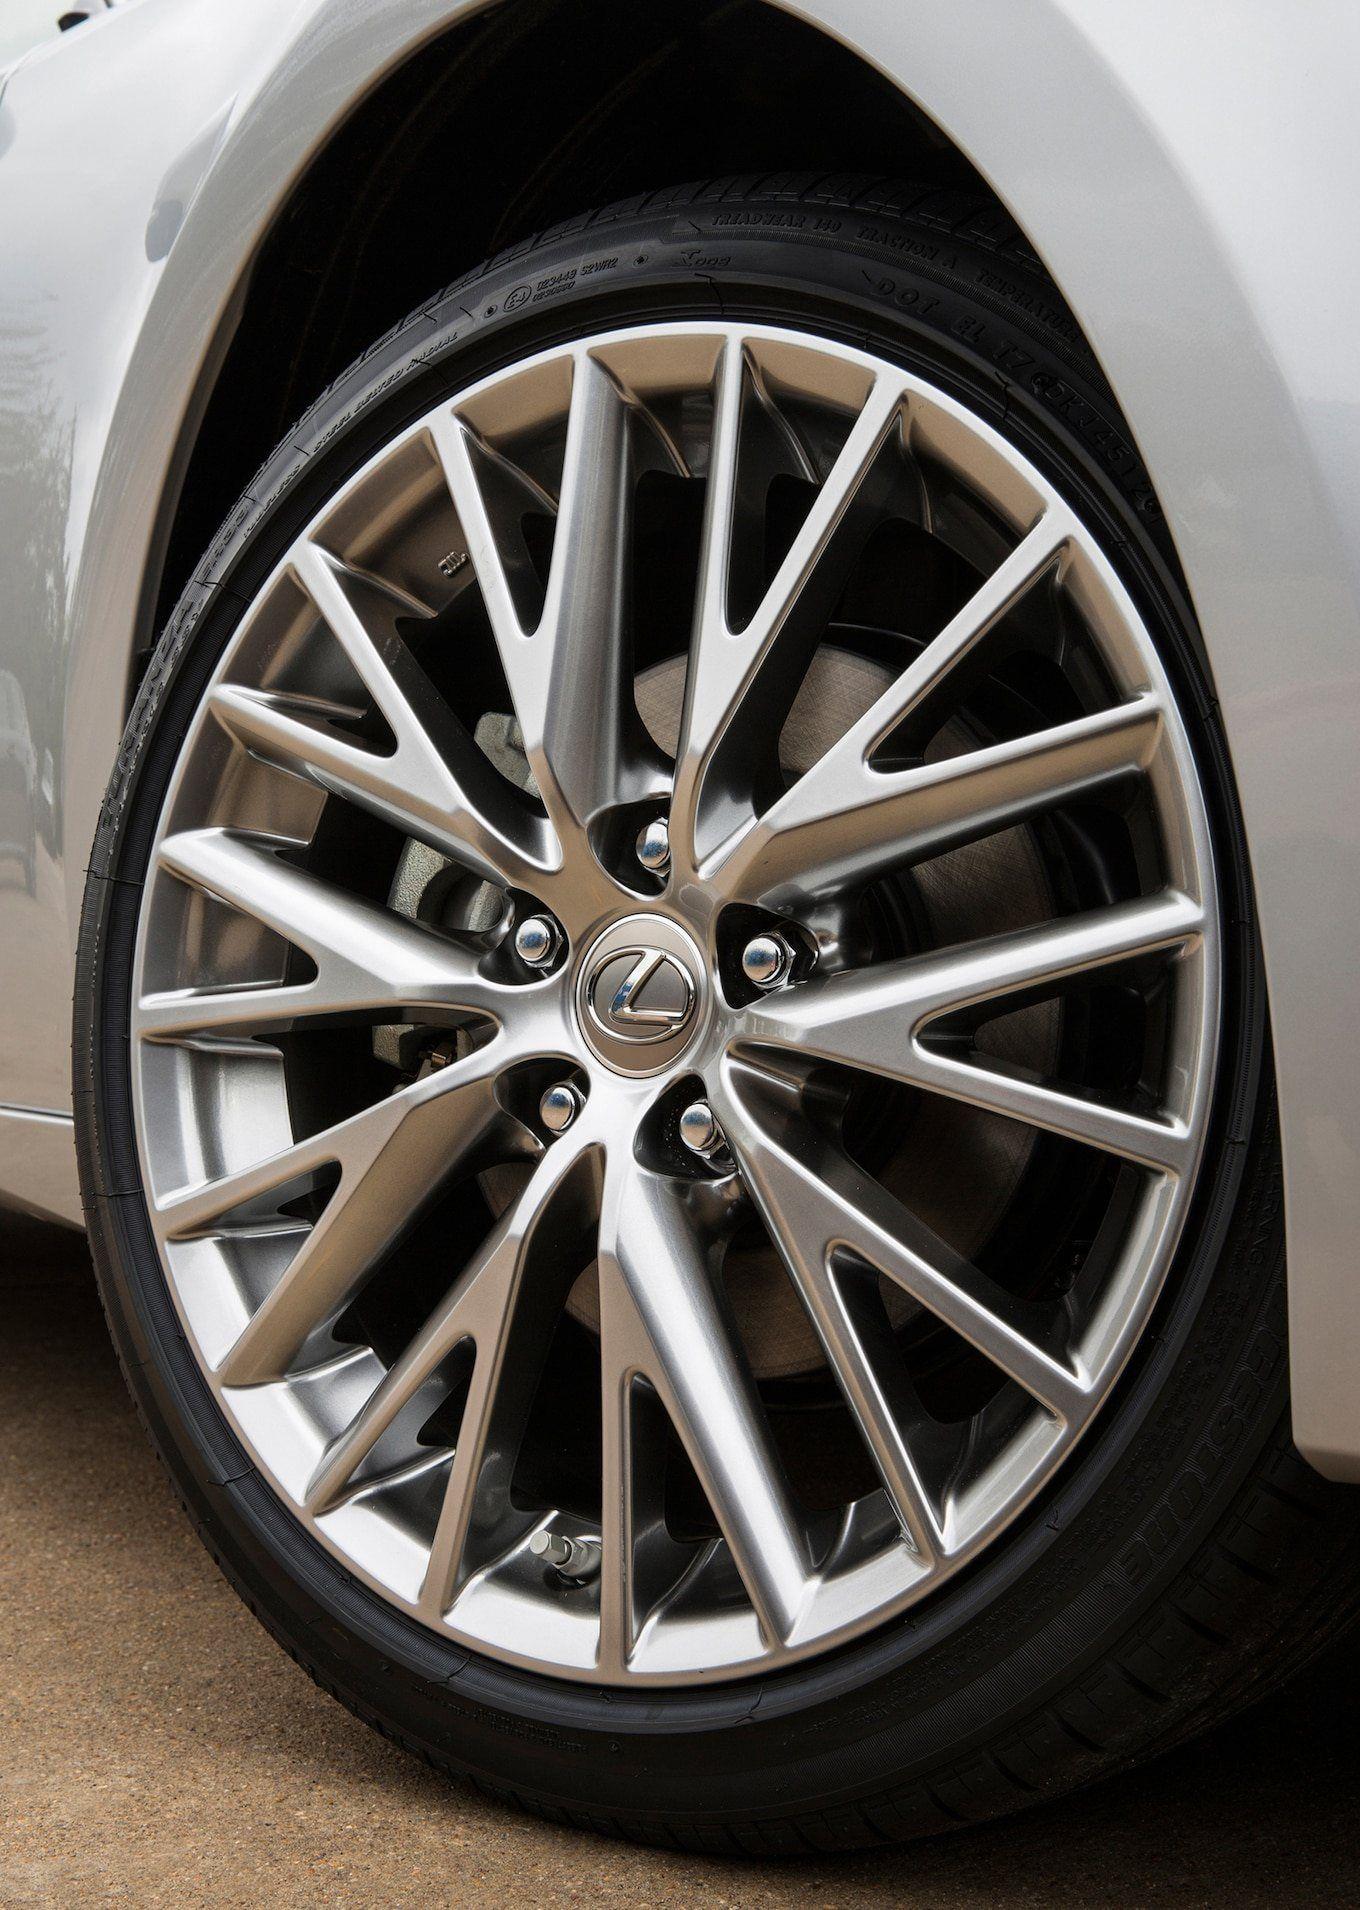 2020 Dodge Dart Srt4 Driving Art Release Date and Concept